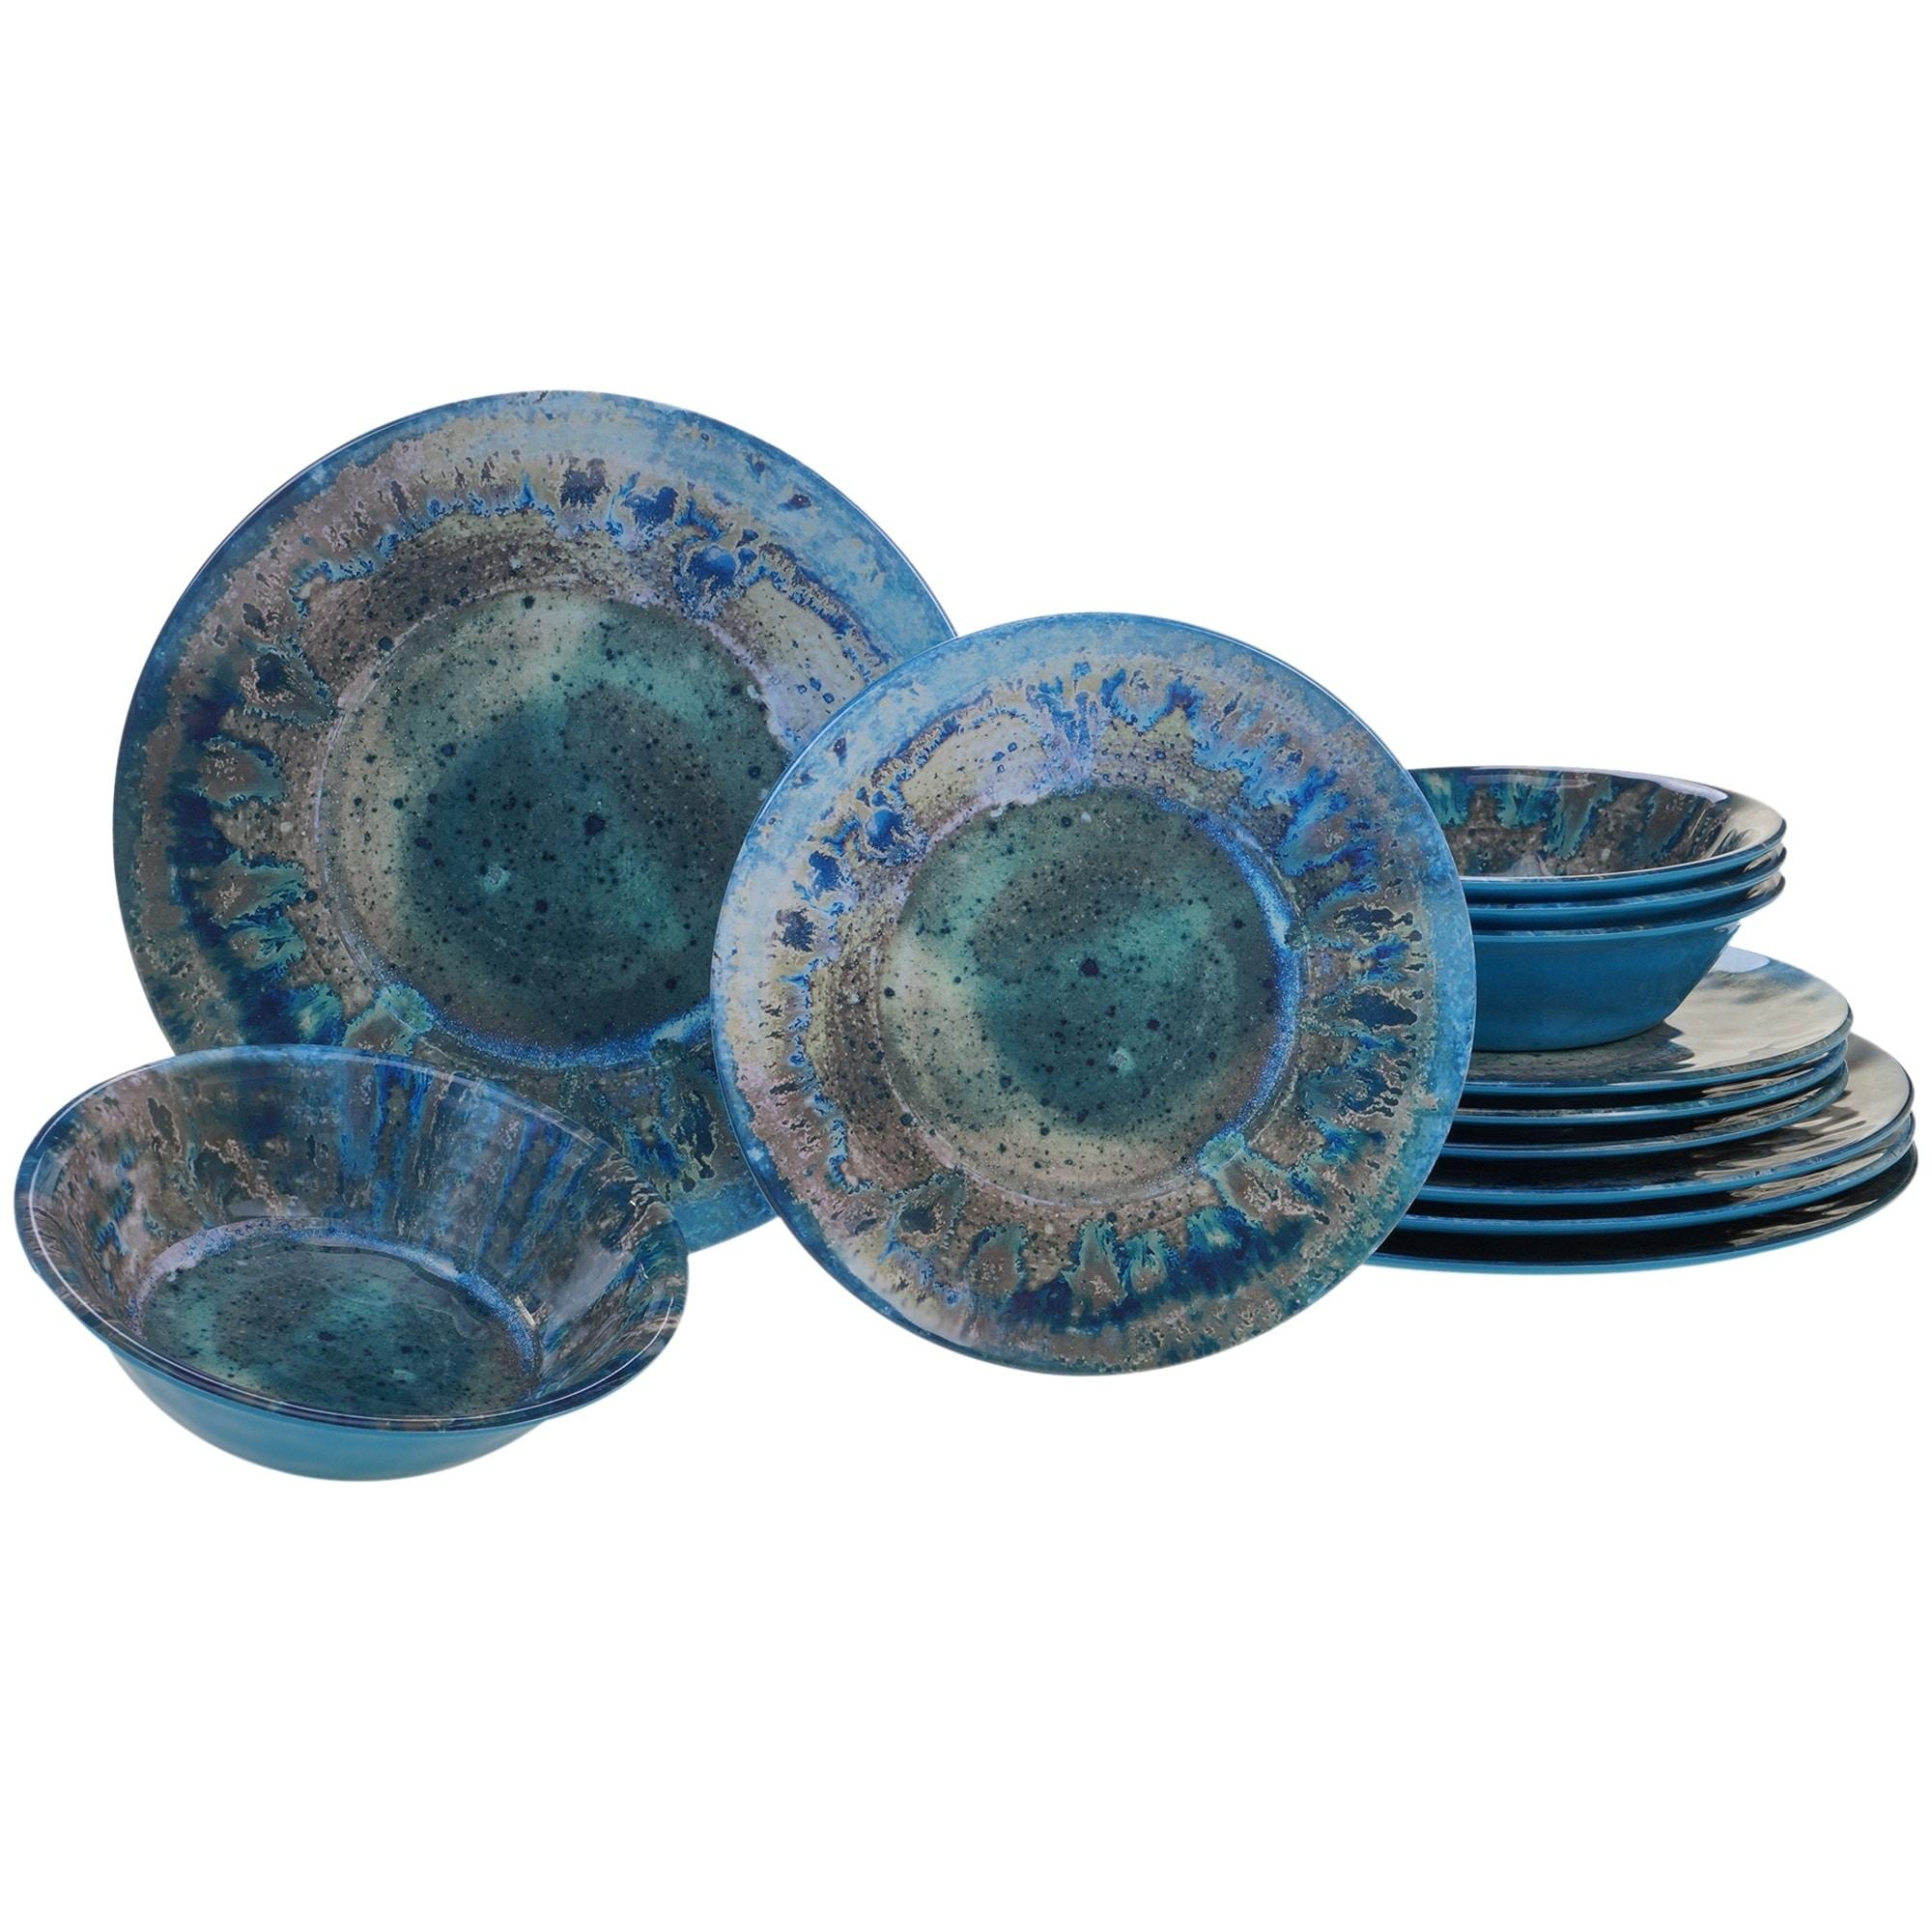 Dishwasher Safe Melamine Dinnerware